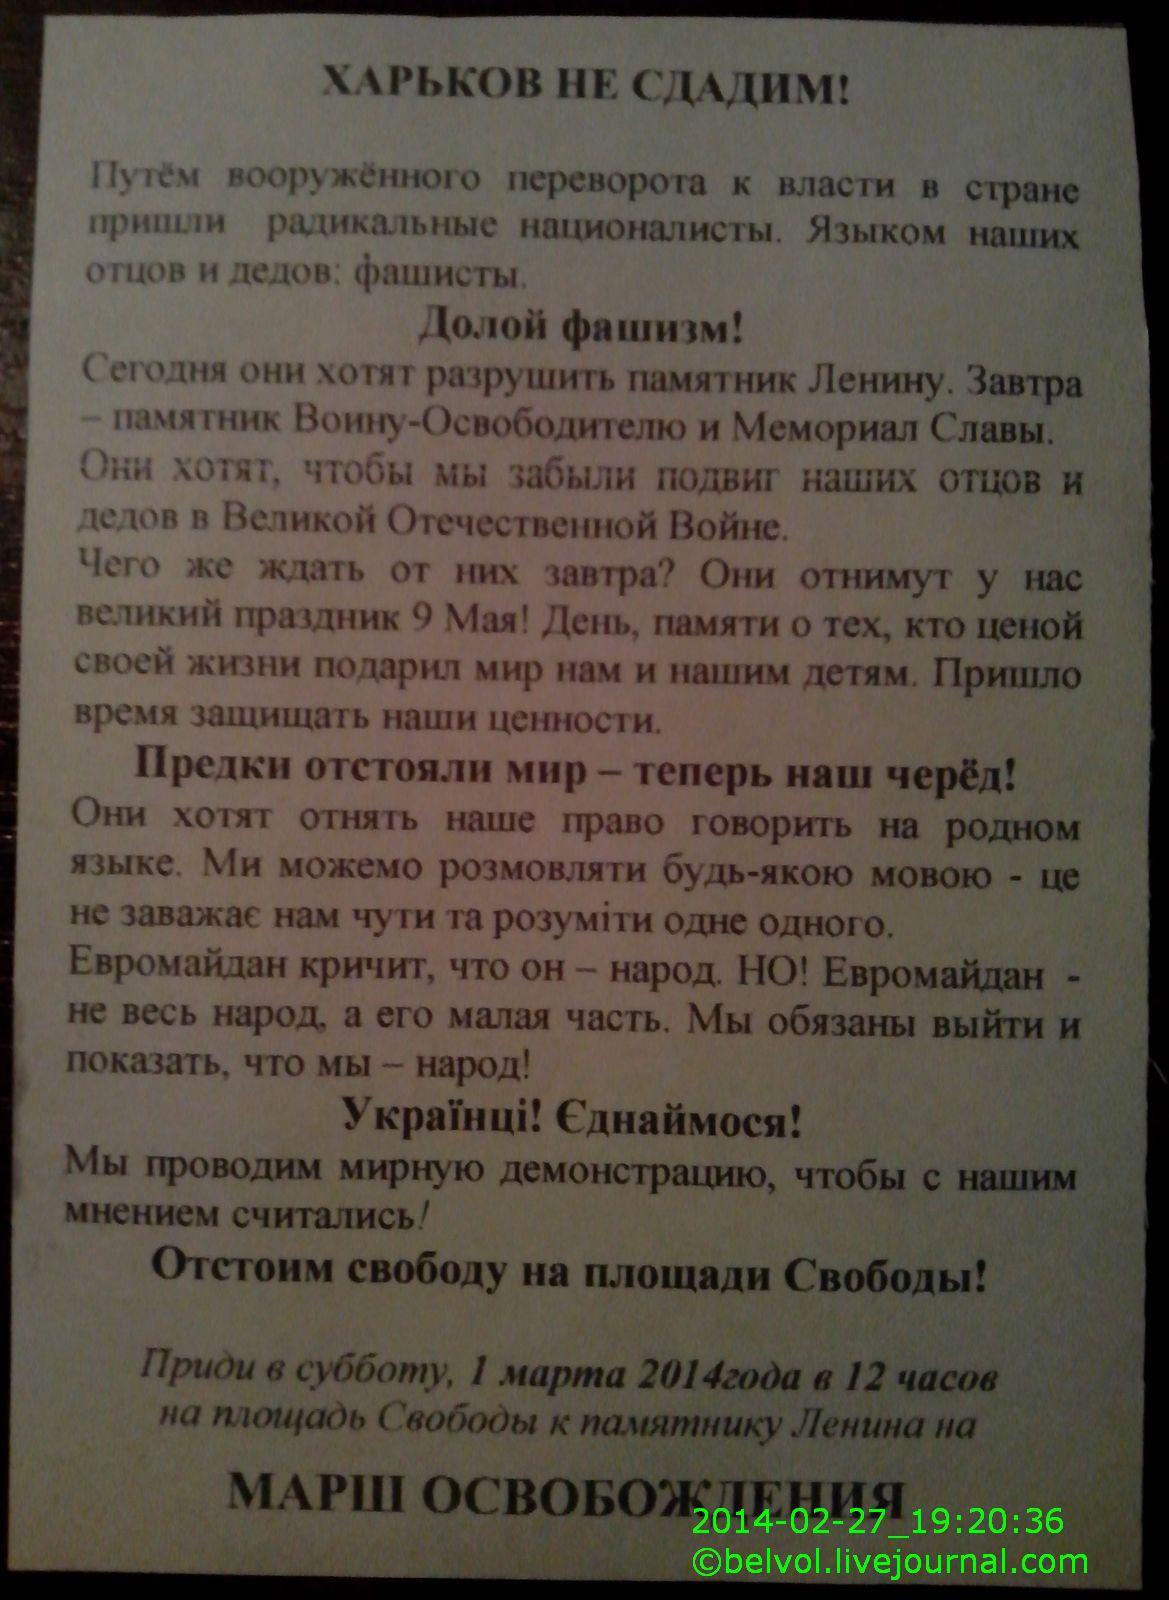 IMG_20140227_192036_1